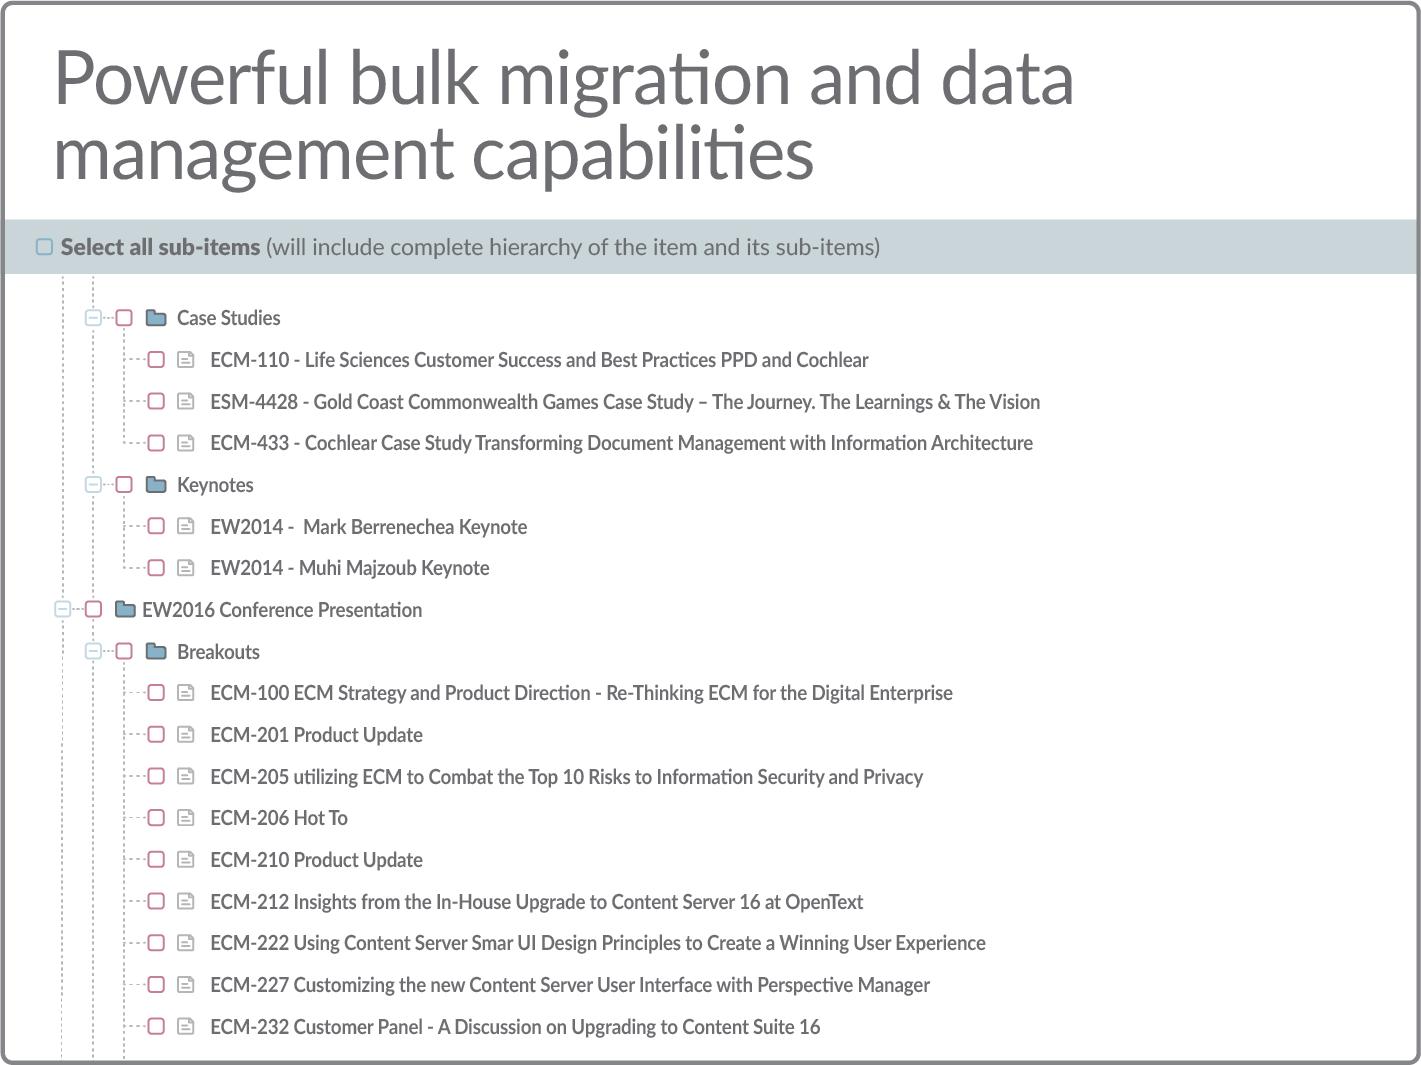 Powerful bulk migration and data management capabilities